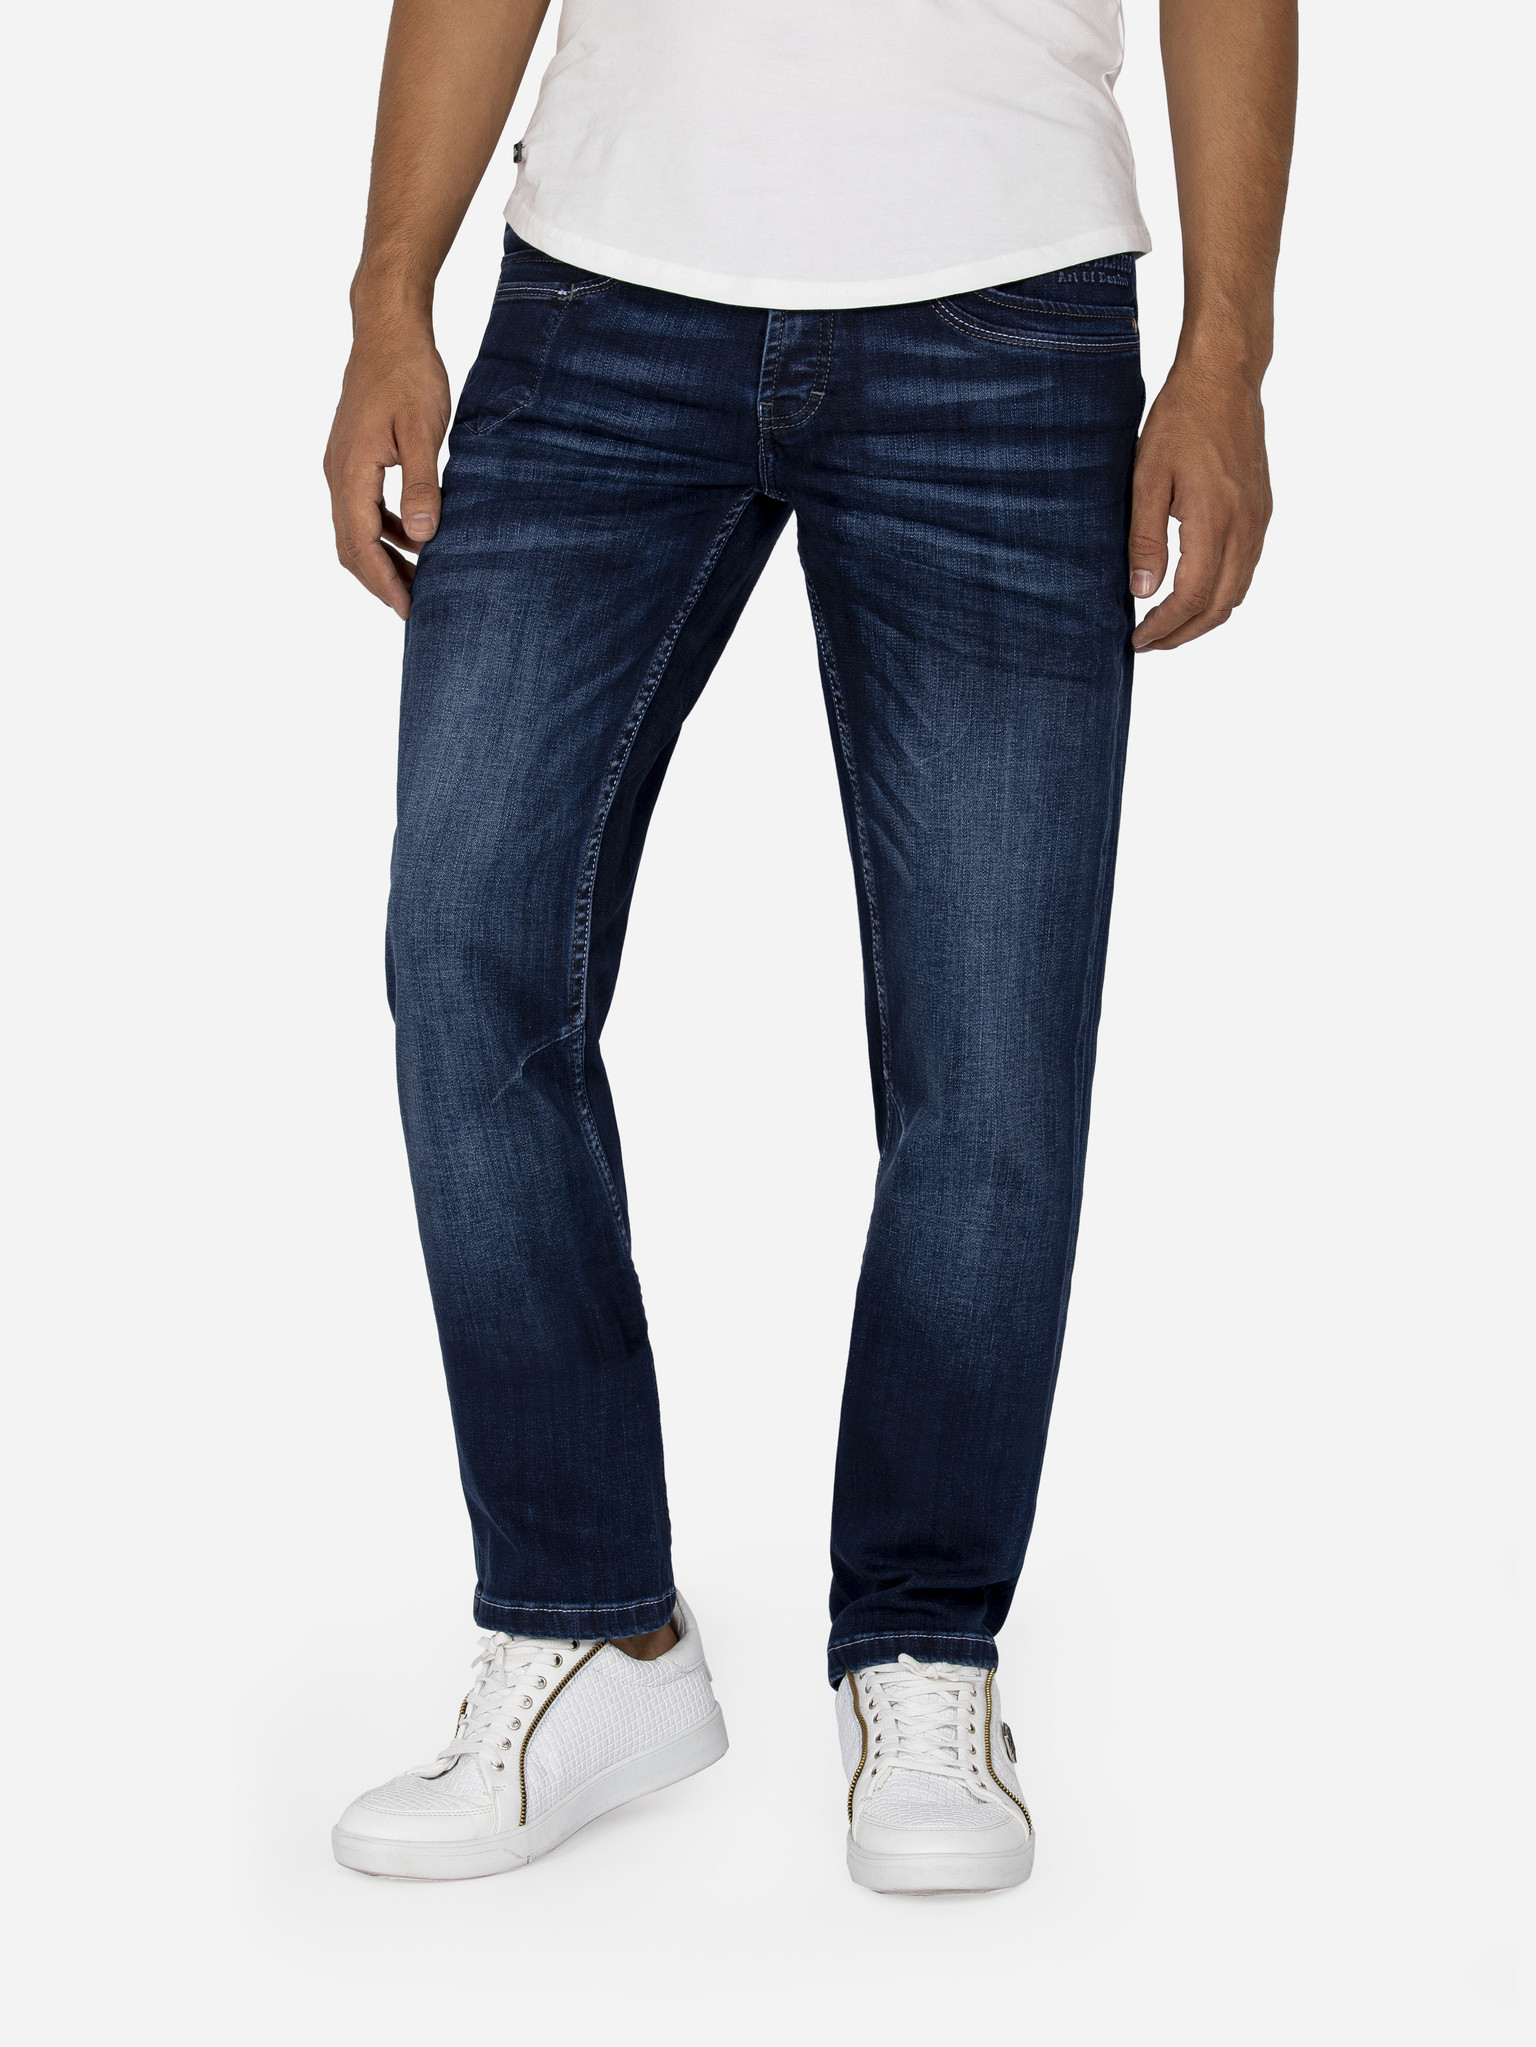 Wam Denim Jeans  Maat: 36/34